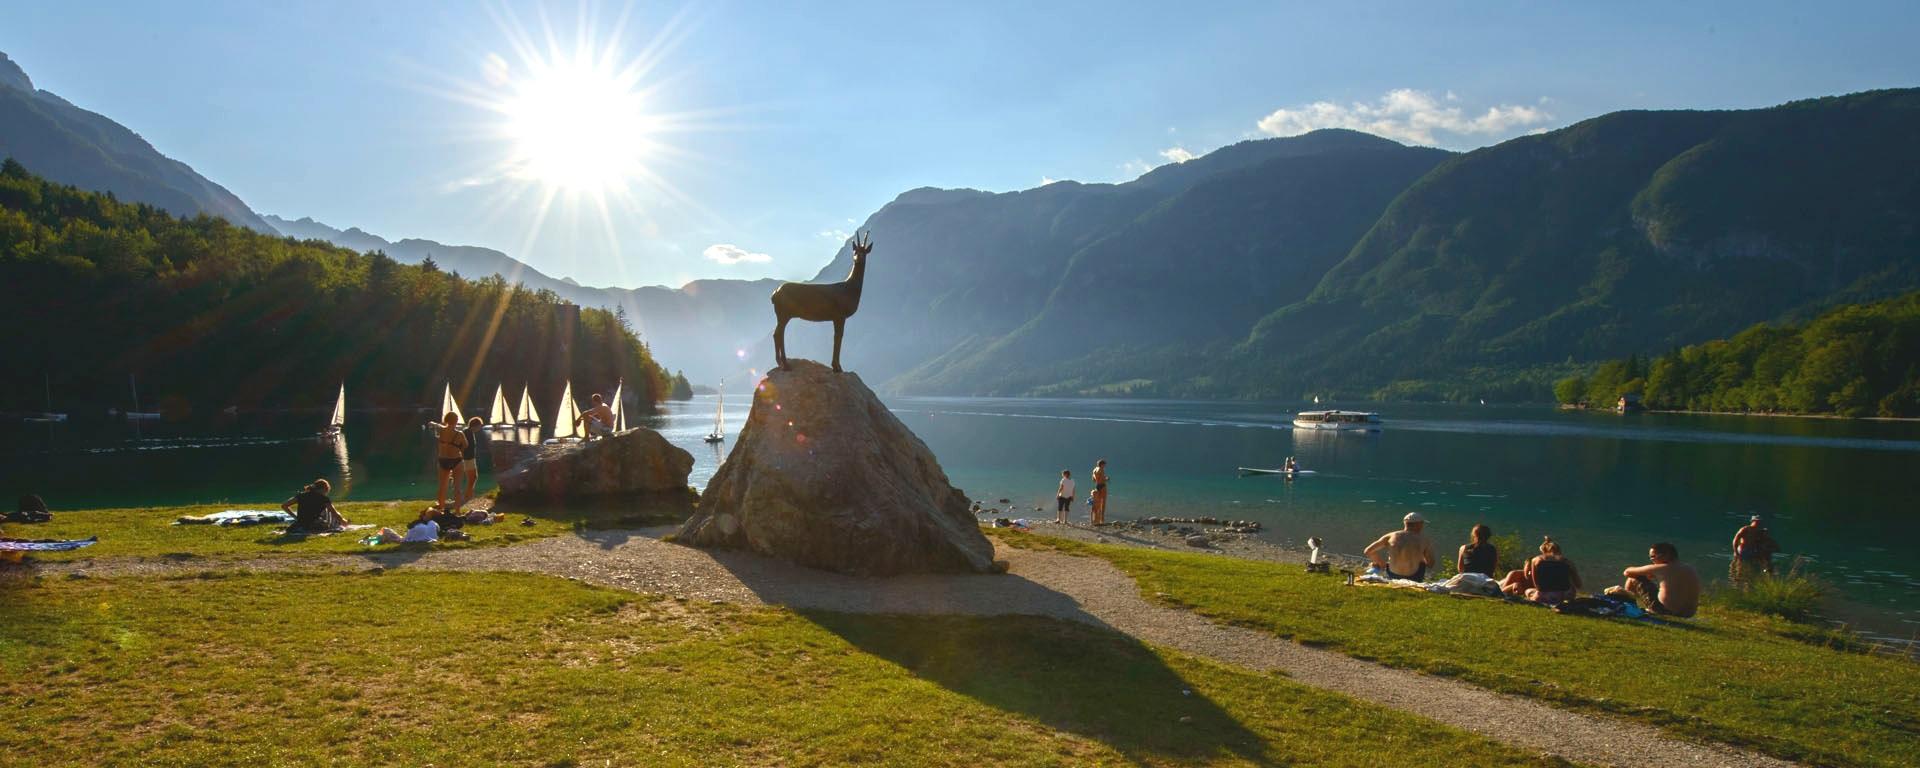 Lake-Bohinj-Slovenia-02-Hero.jpg